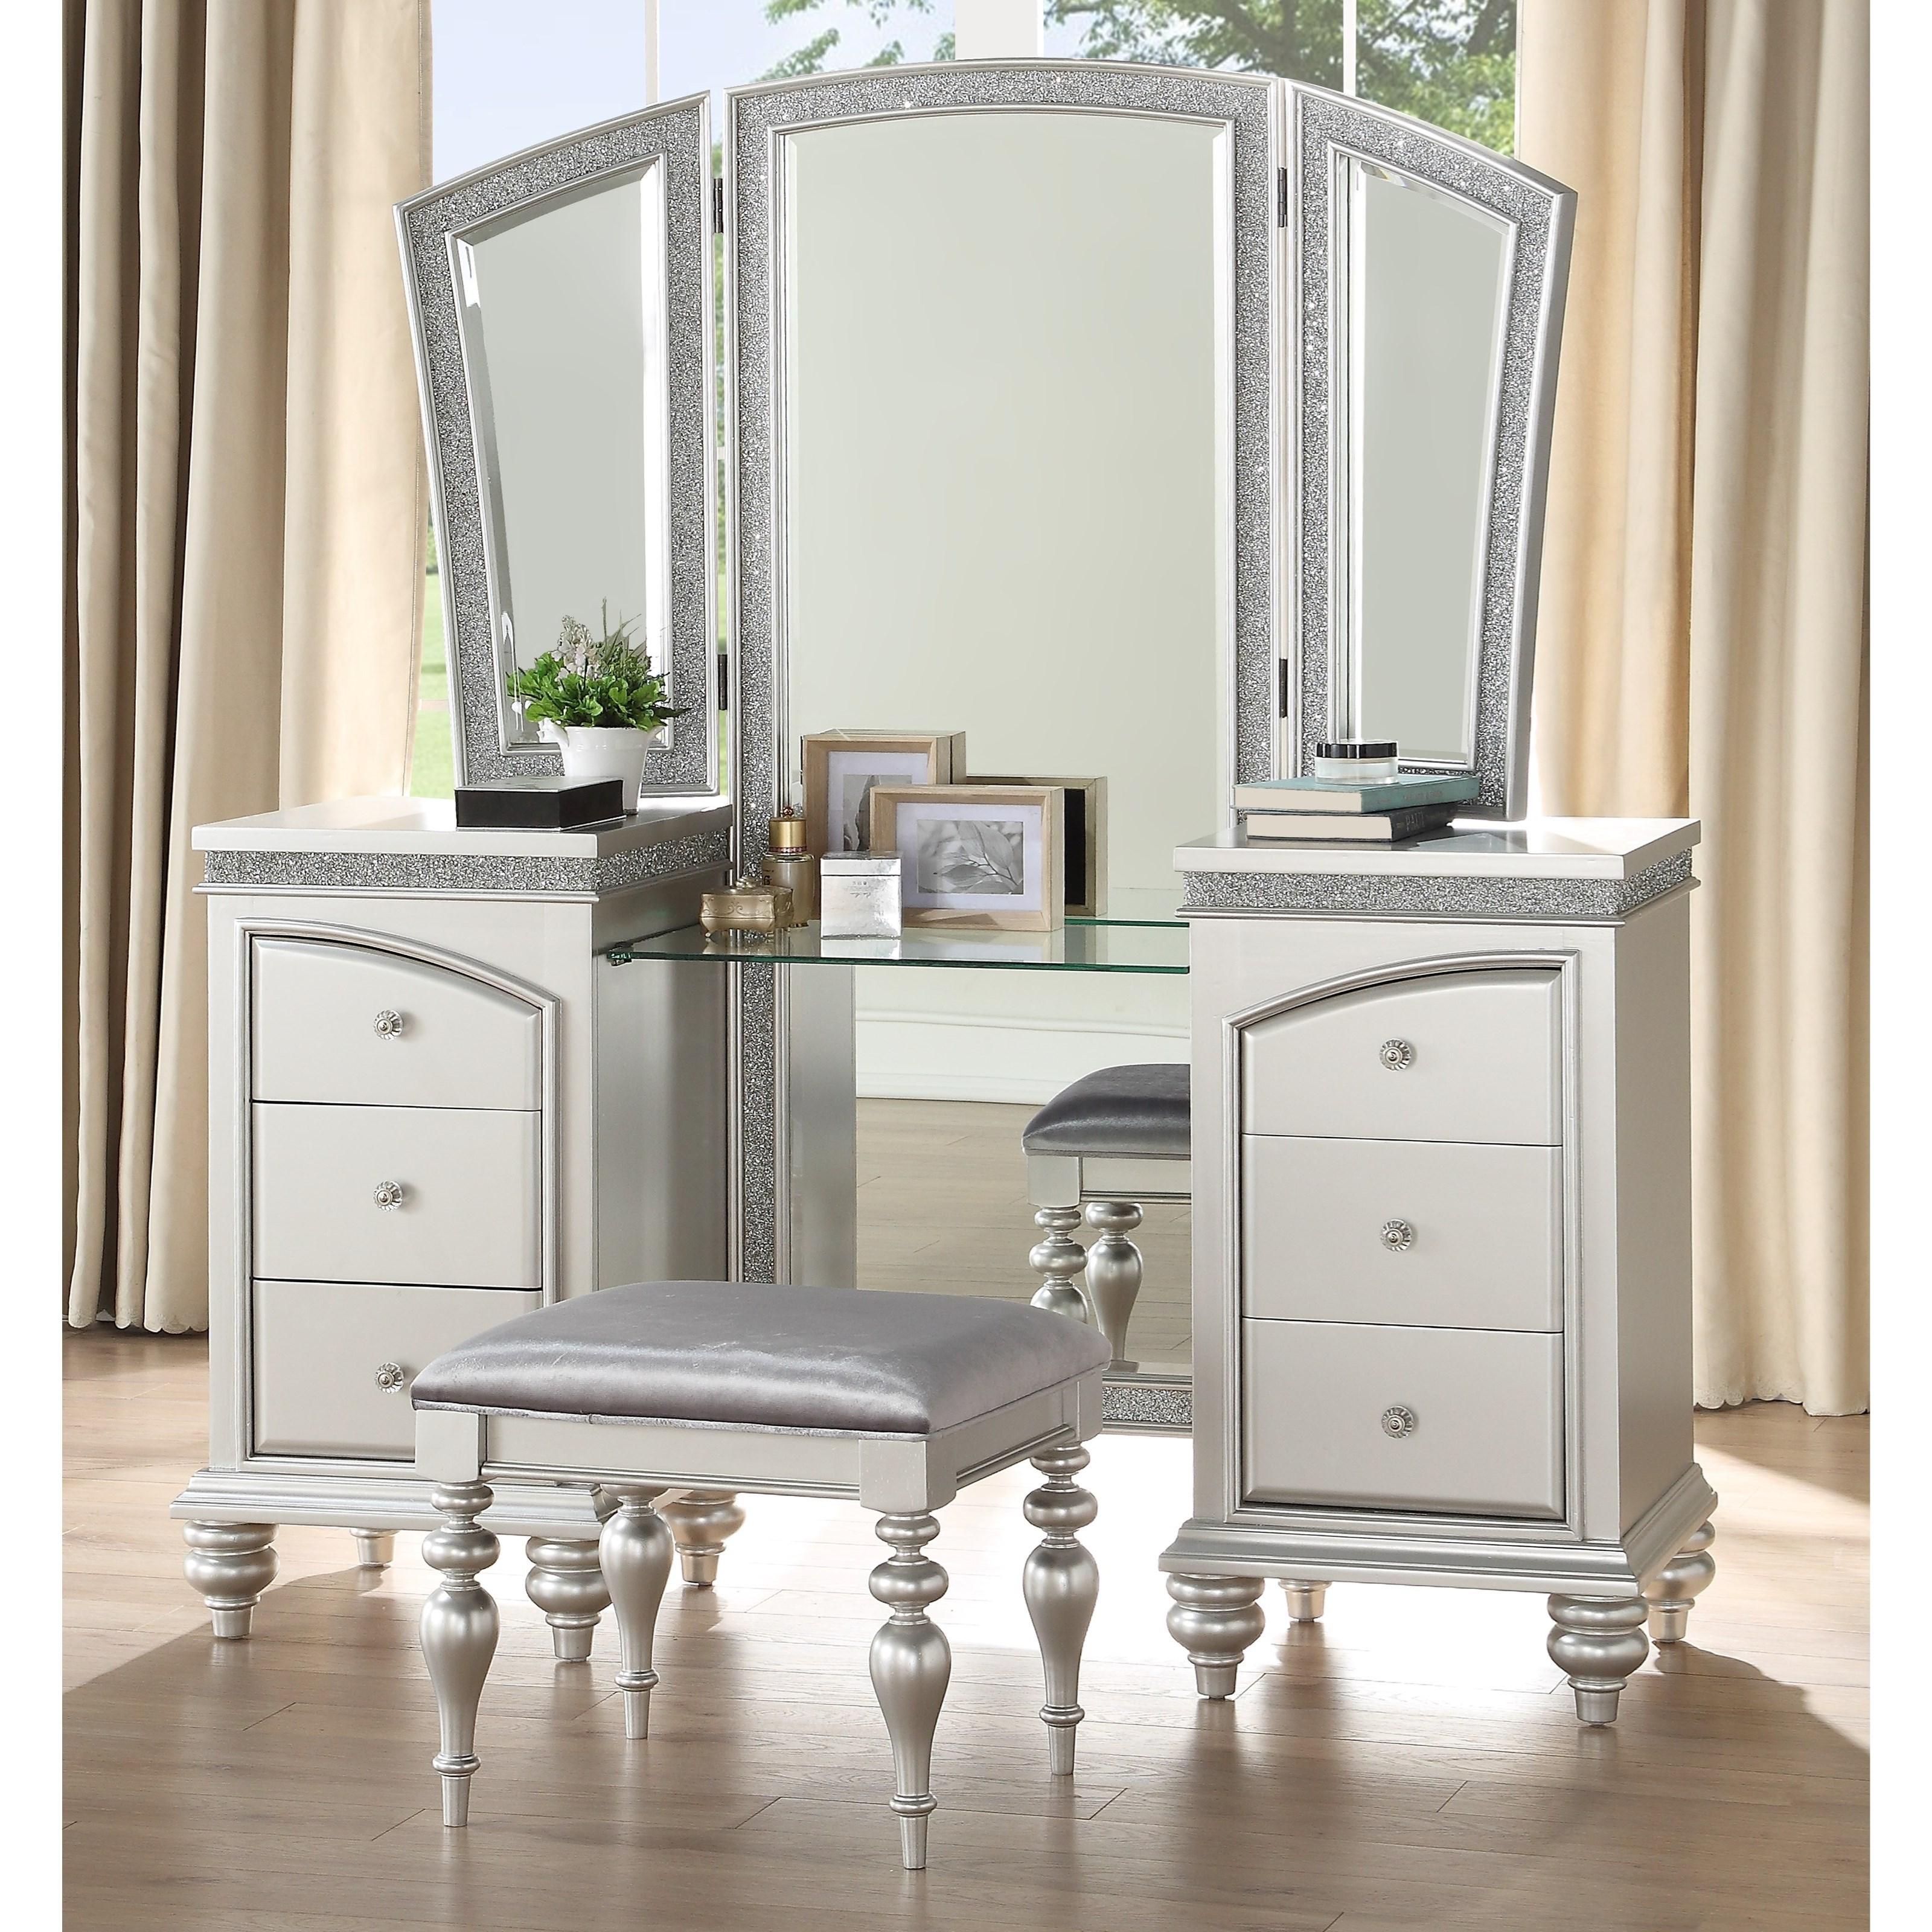 Acme Furniture Maverick Glam 6 Drawer Vanity Set Rooms For Less Vanities Vanity Sets